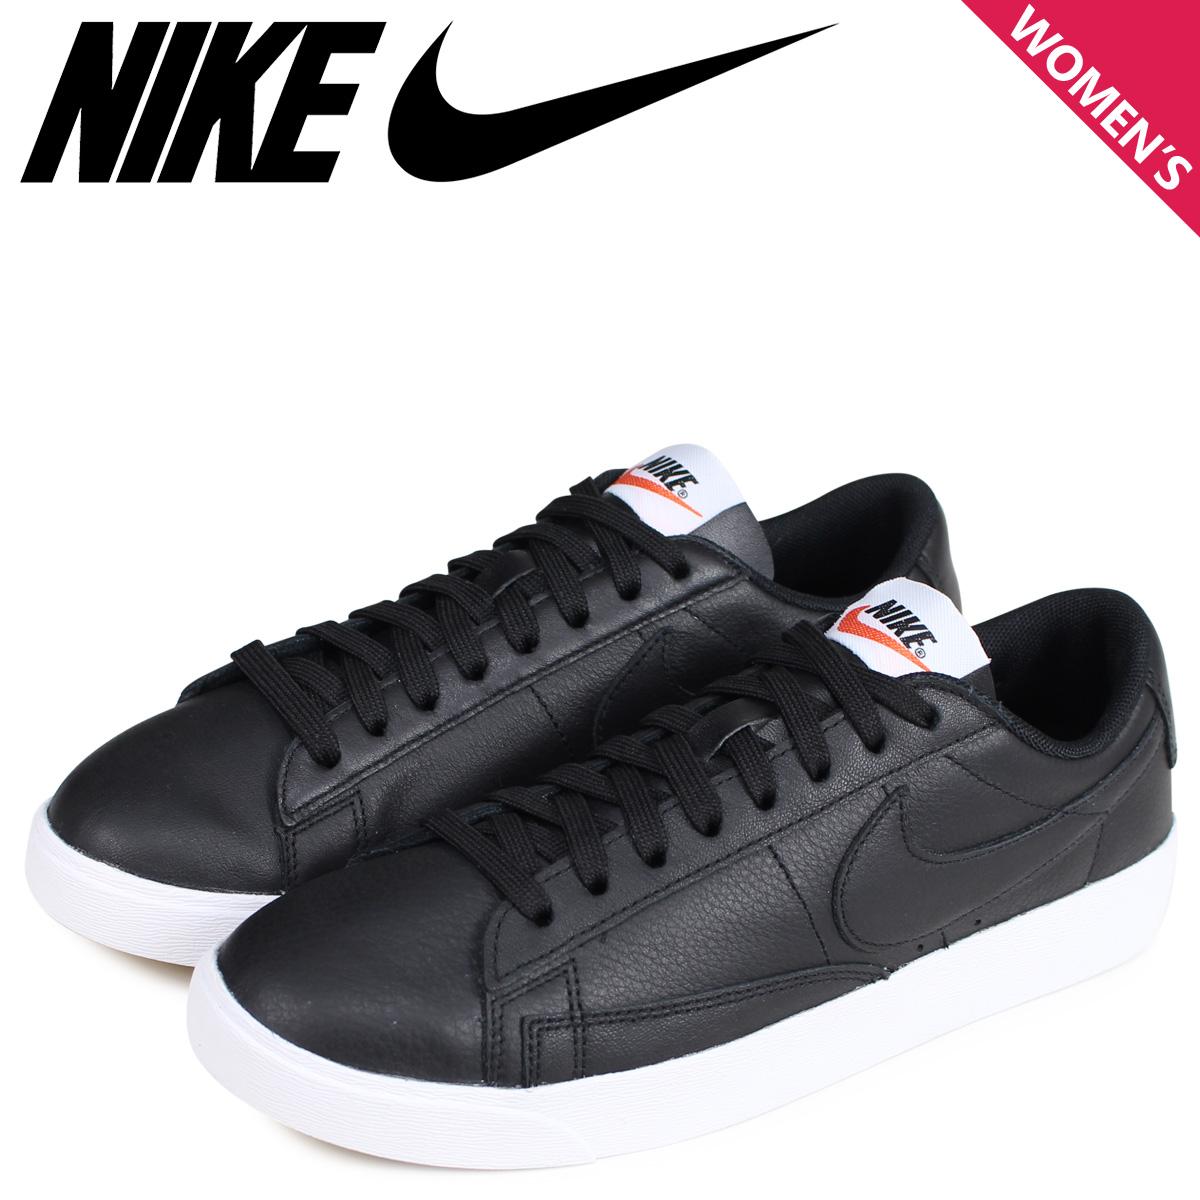 new arrivals bc255 cfdcc NIKE Nike blazer low sneakers Lady's WMNS BLAZER LOW LEATHER black black  AQ1777-001